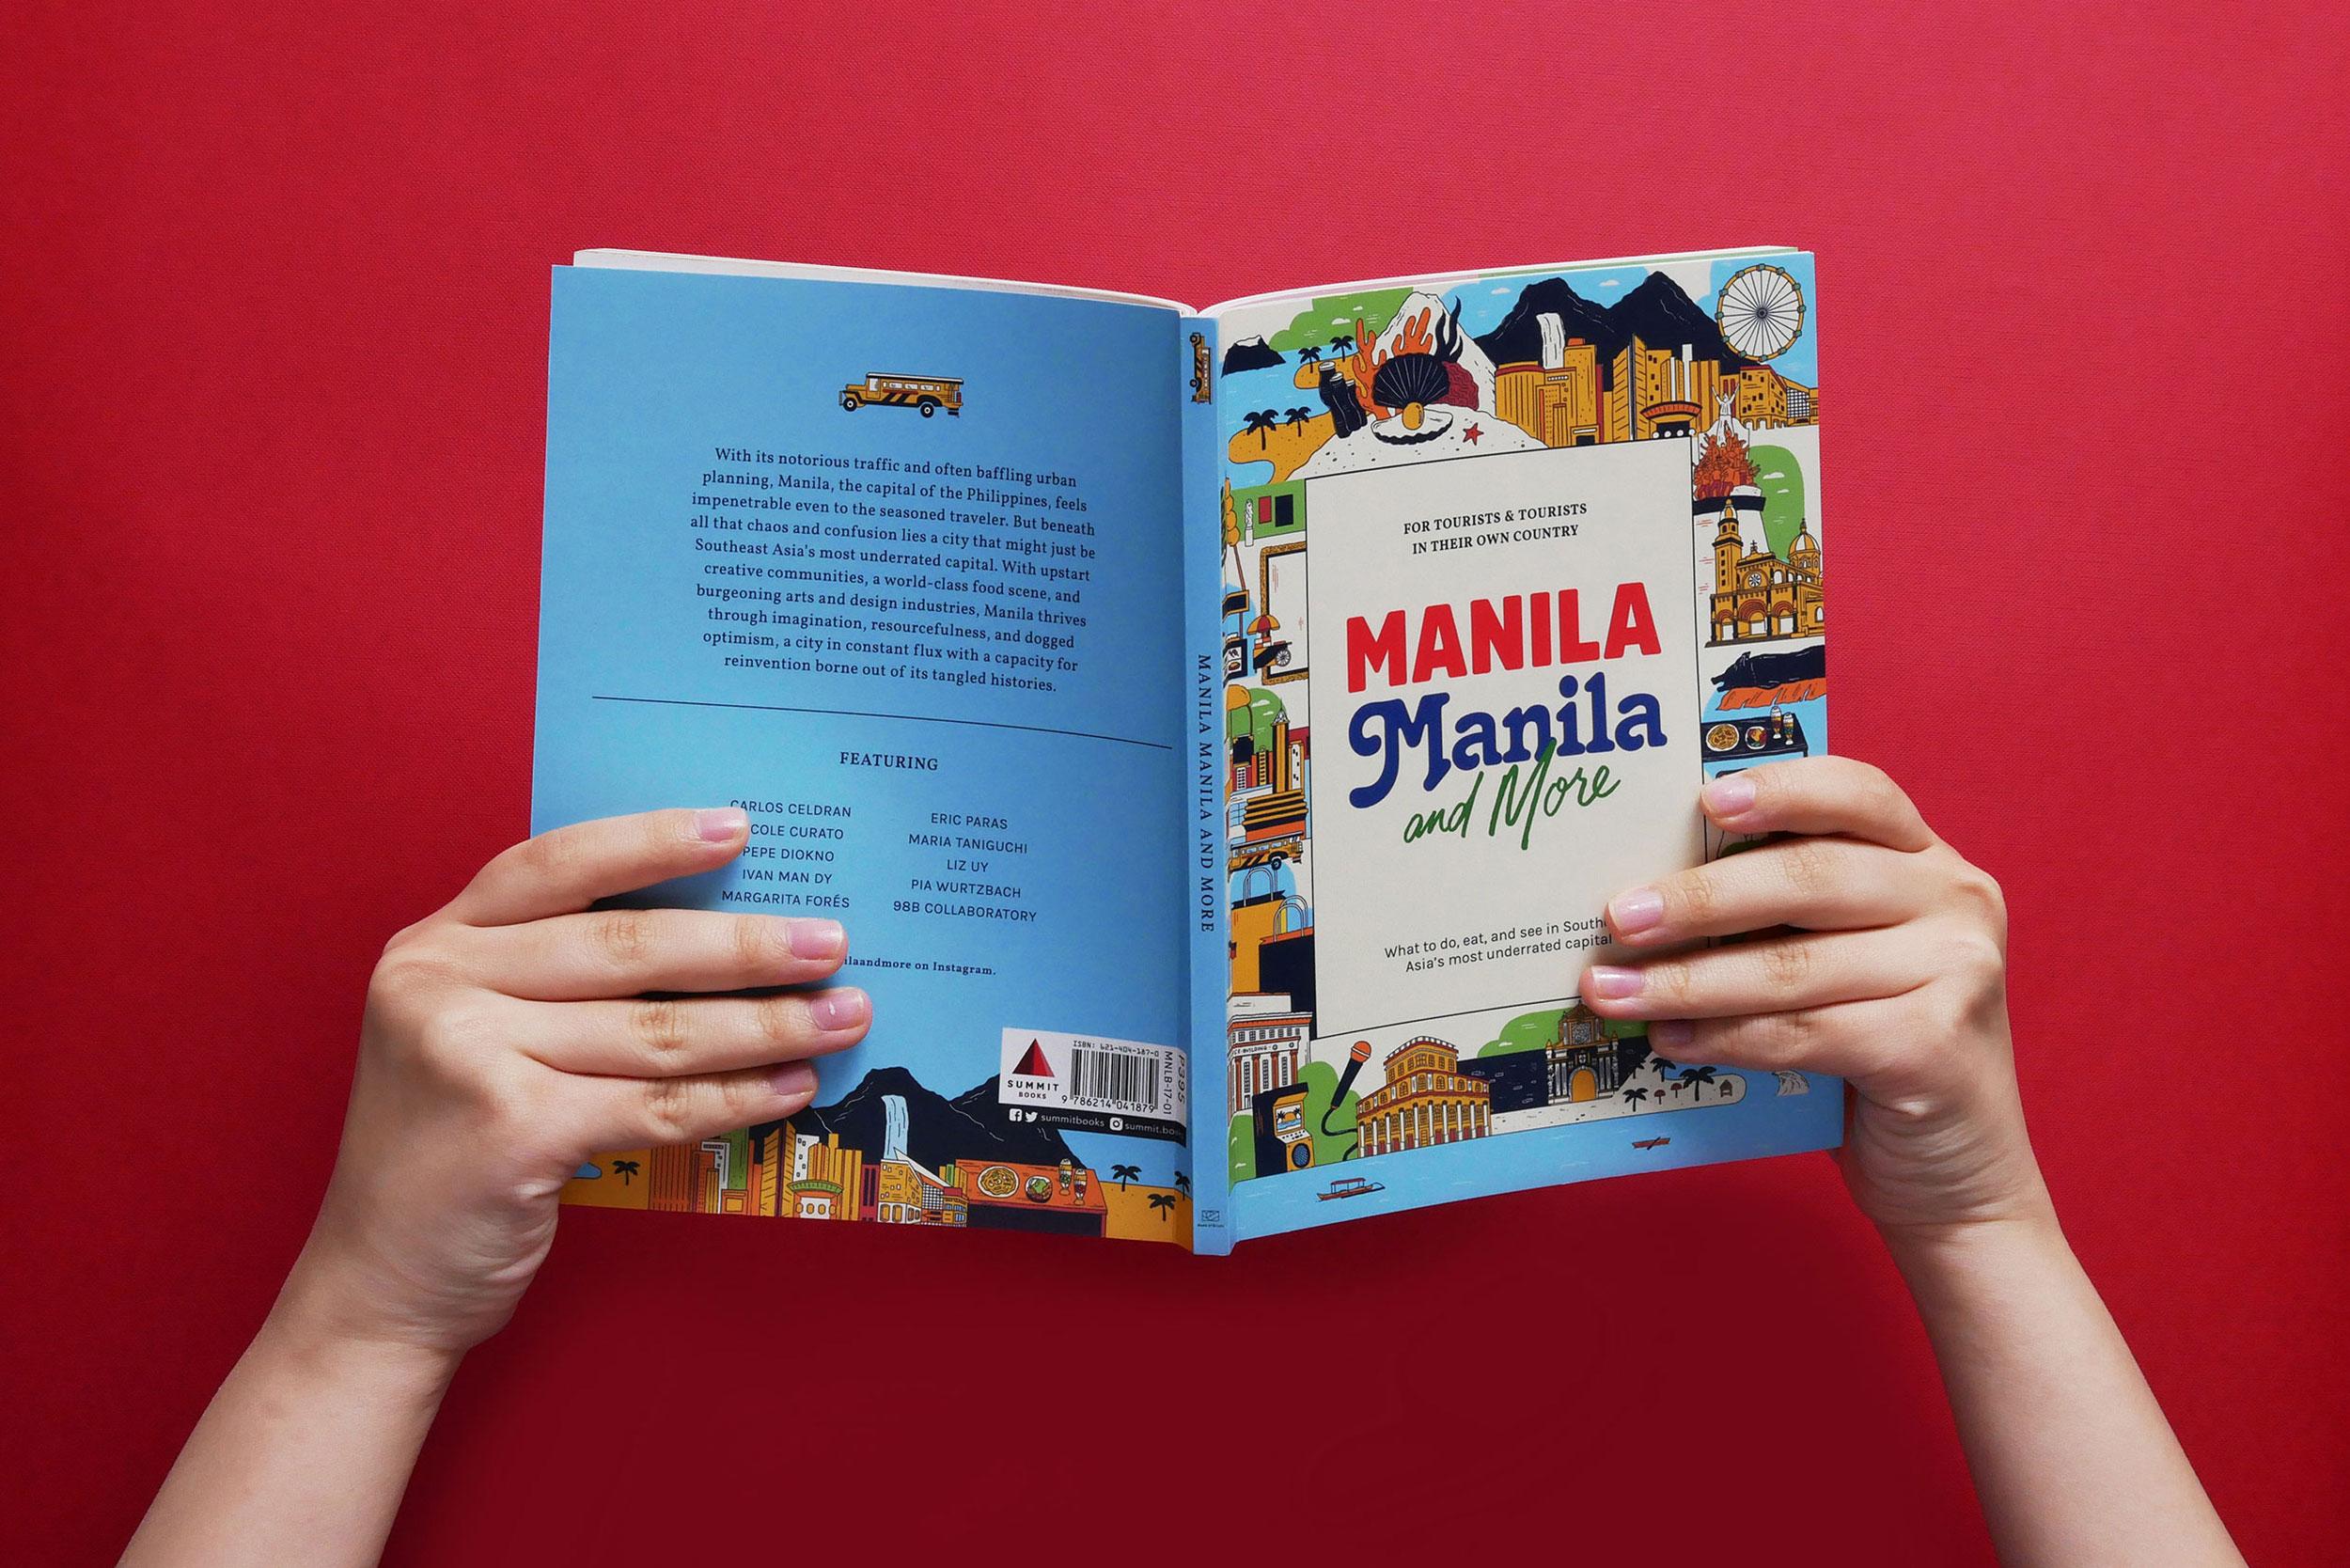 Manila, Manila, and More  The Manila we know and love